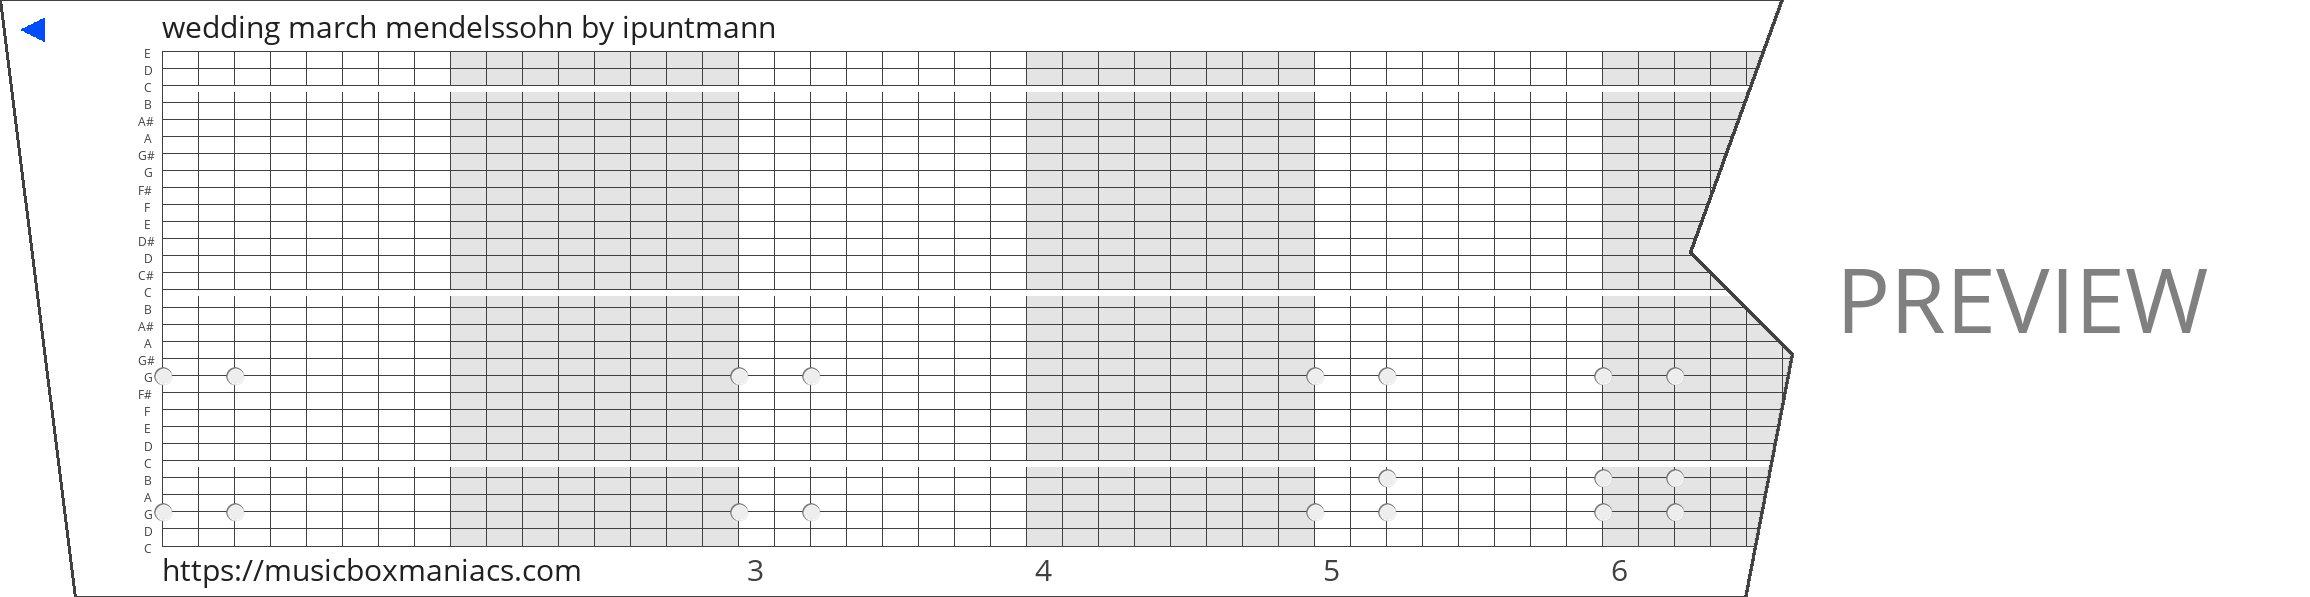 wedding march mendelssohn 30 note music box paper strip